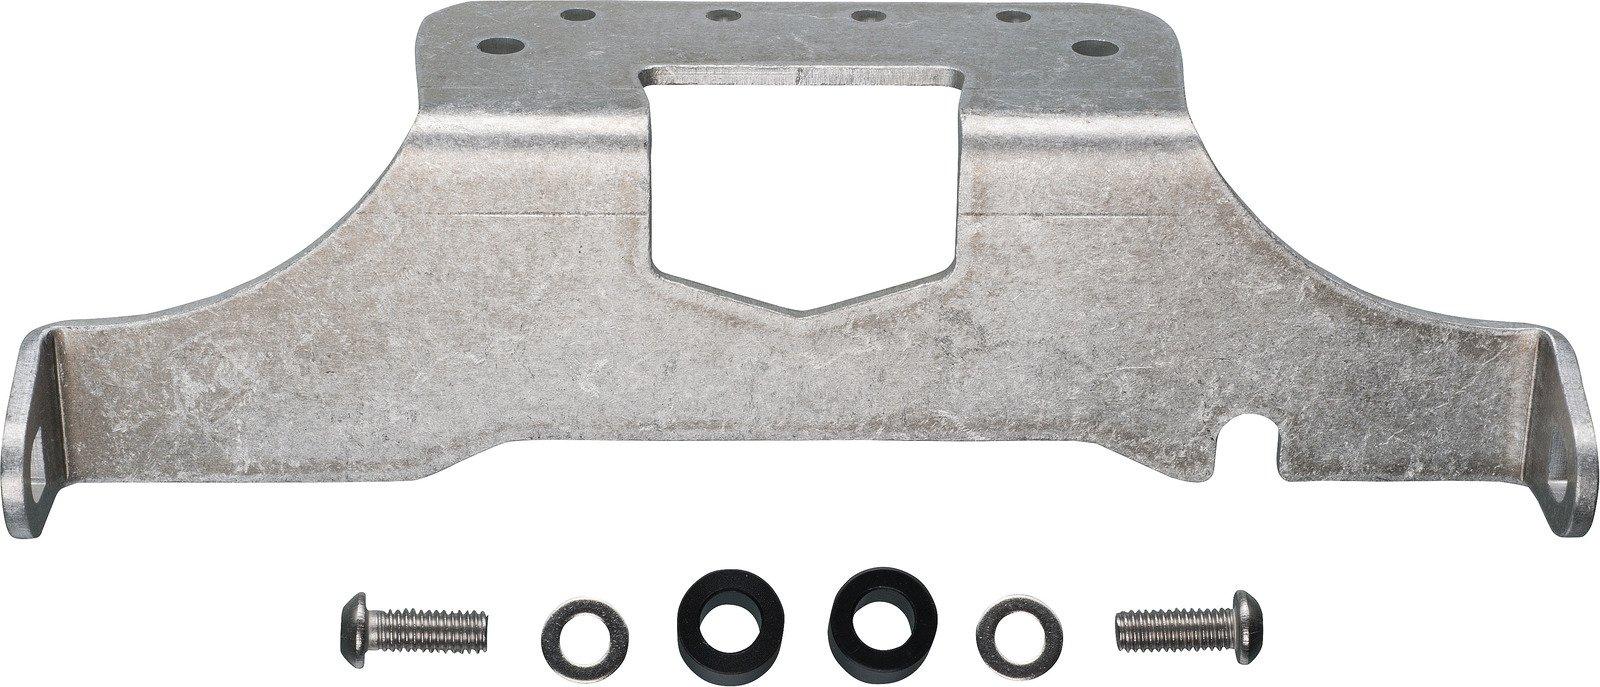 Triumph Bonneville Scrambler Thruxton  Front Indicator Bracket incl. Material for 41085/41135 Indicators JVB0015